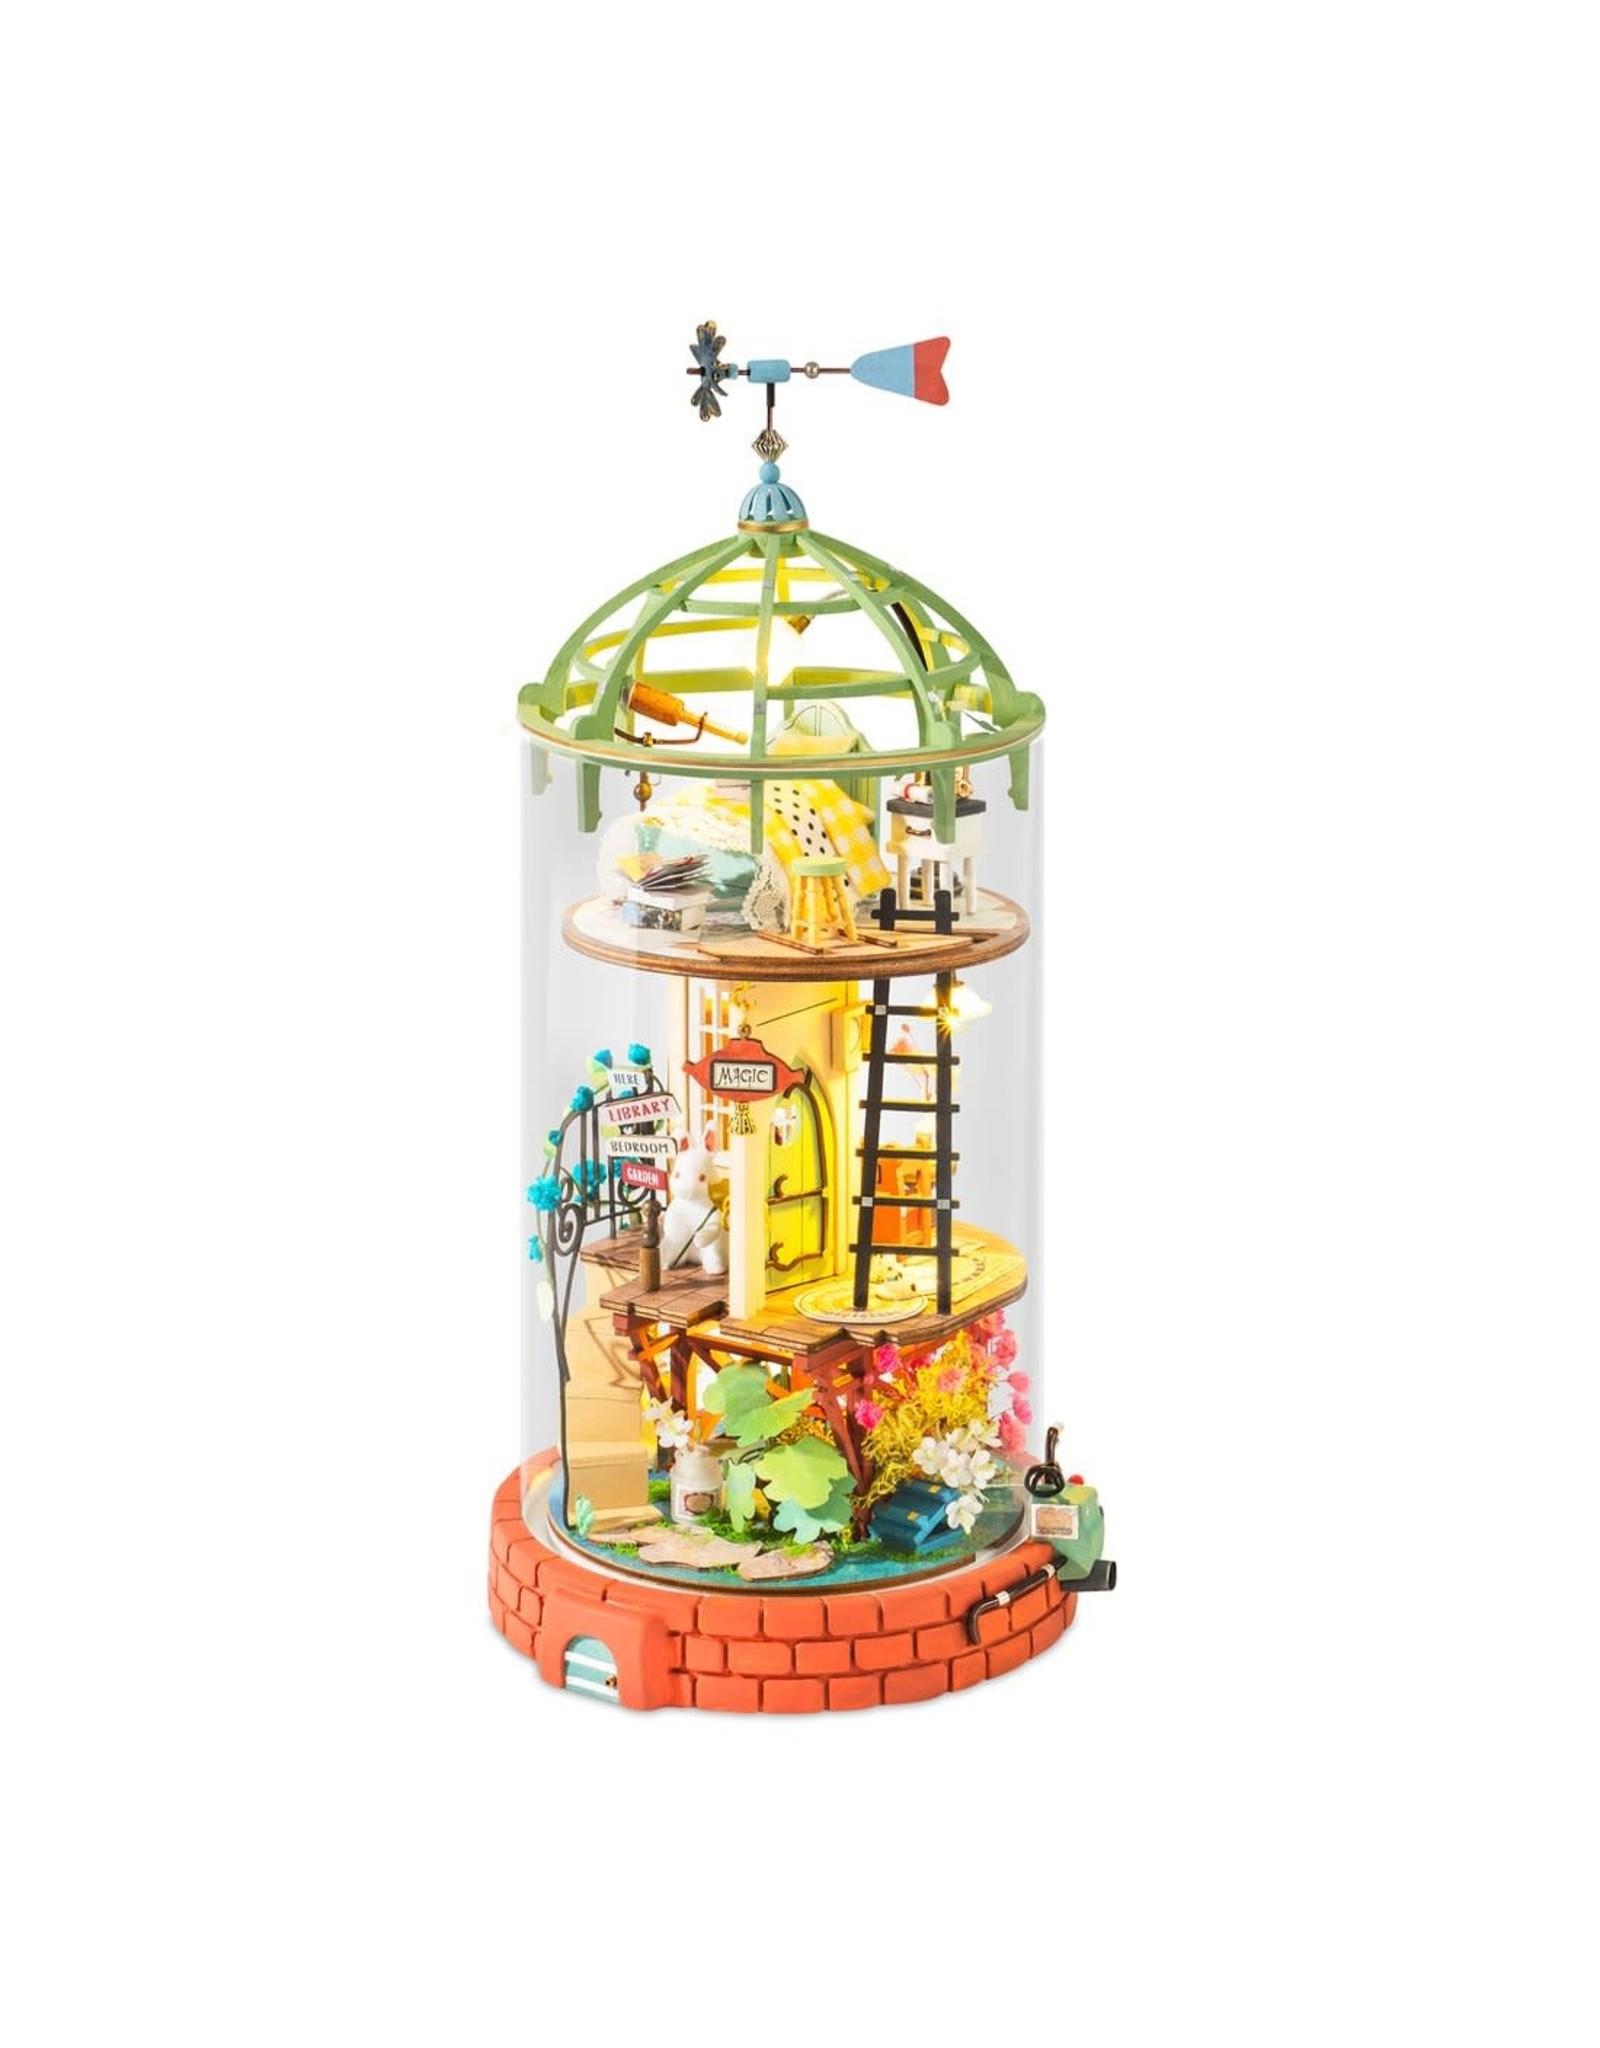 Hands Craft Domed Loft DIY Miniature Dollhouse Kit